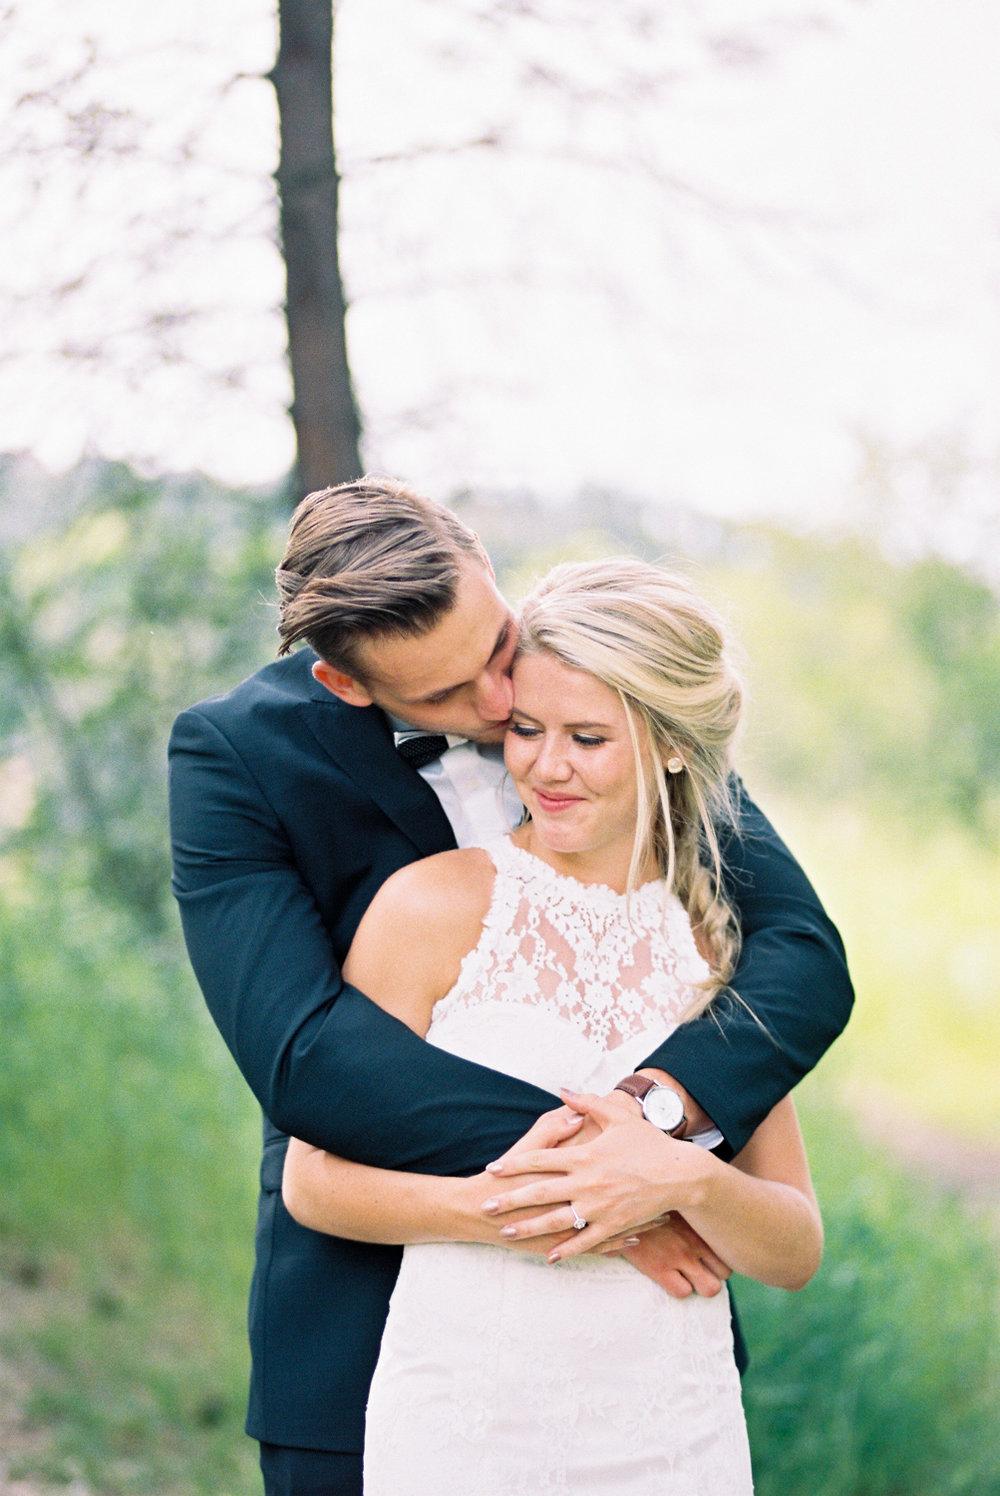 ivyandrosephoto-kelowna-wedding-161.jpg